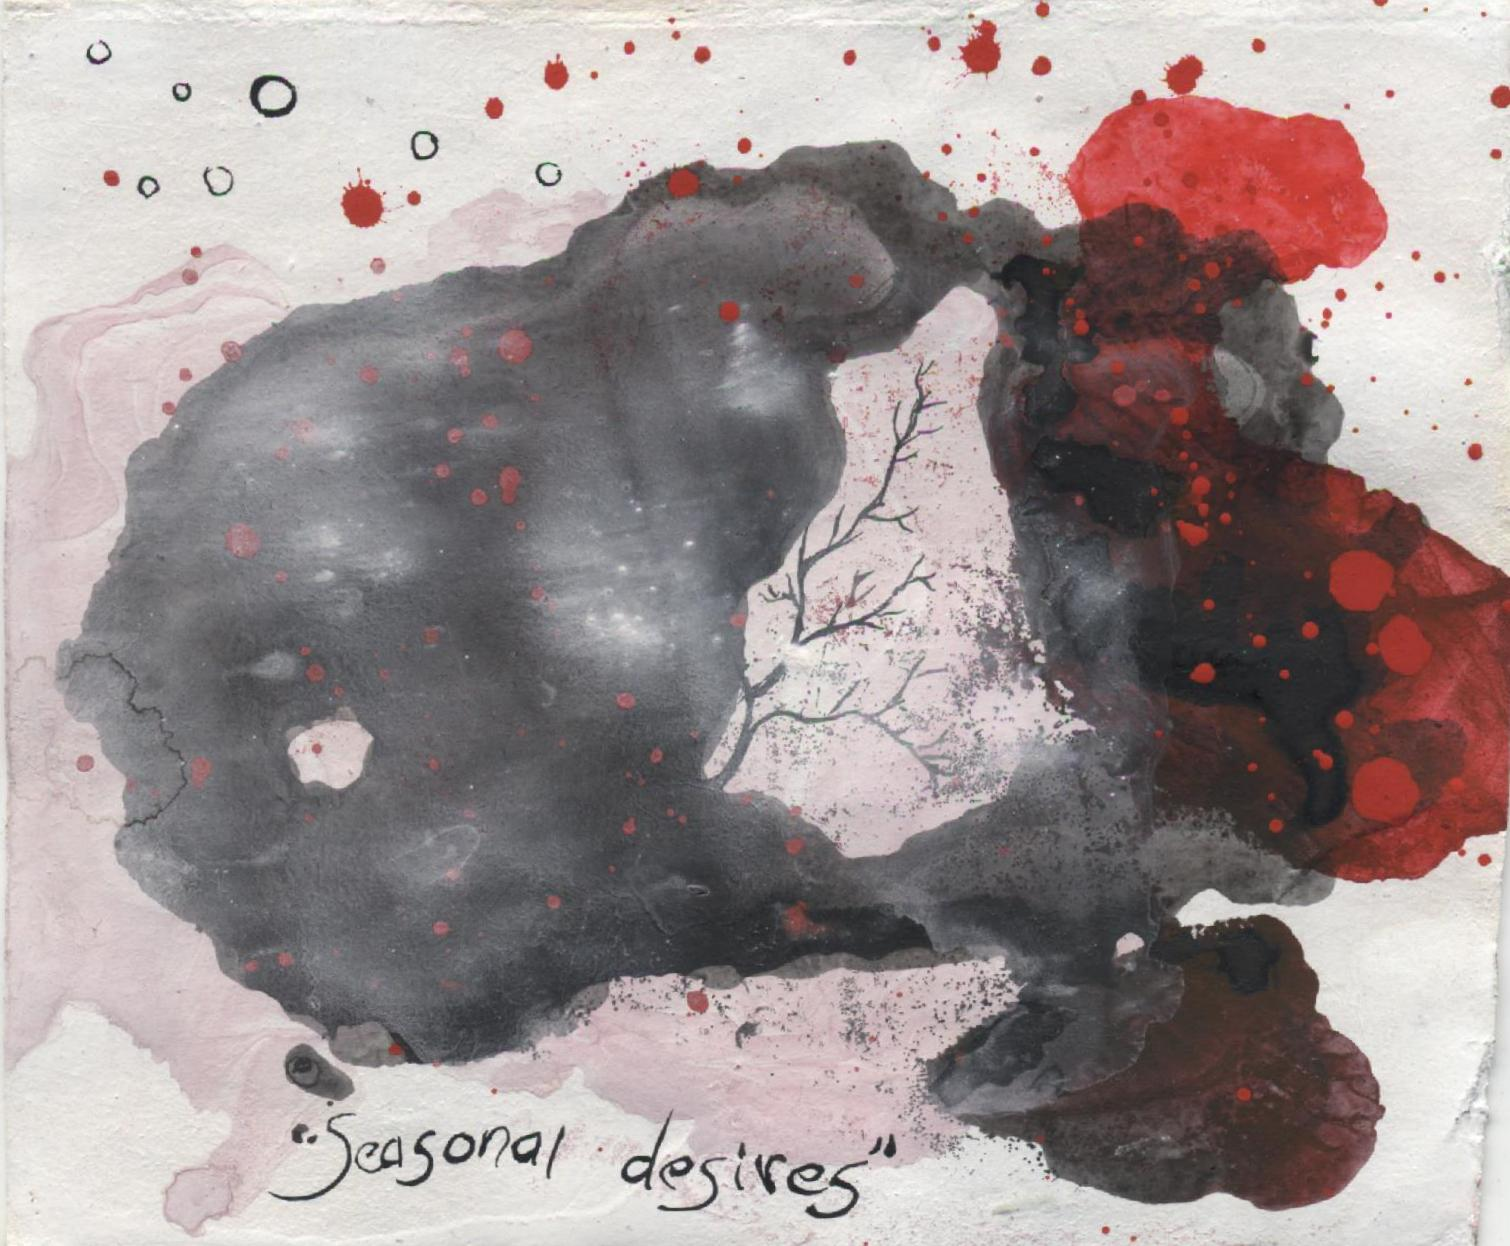 Seasonal desires